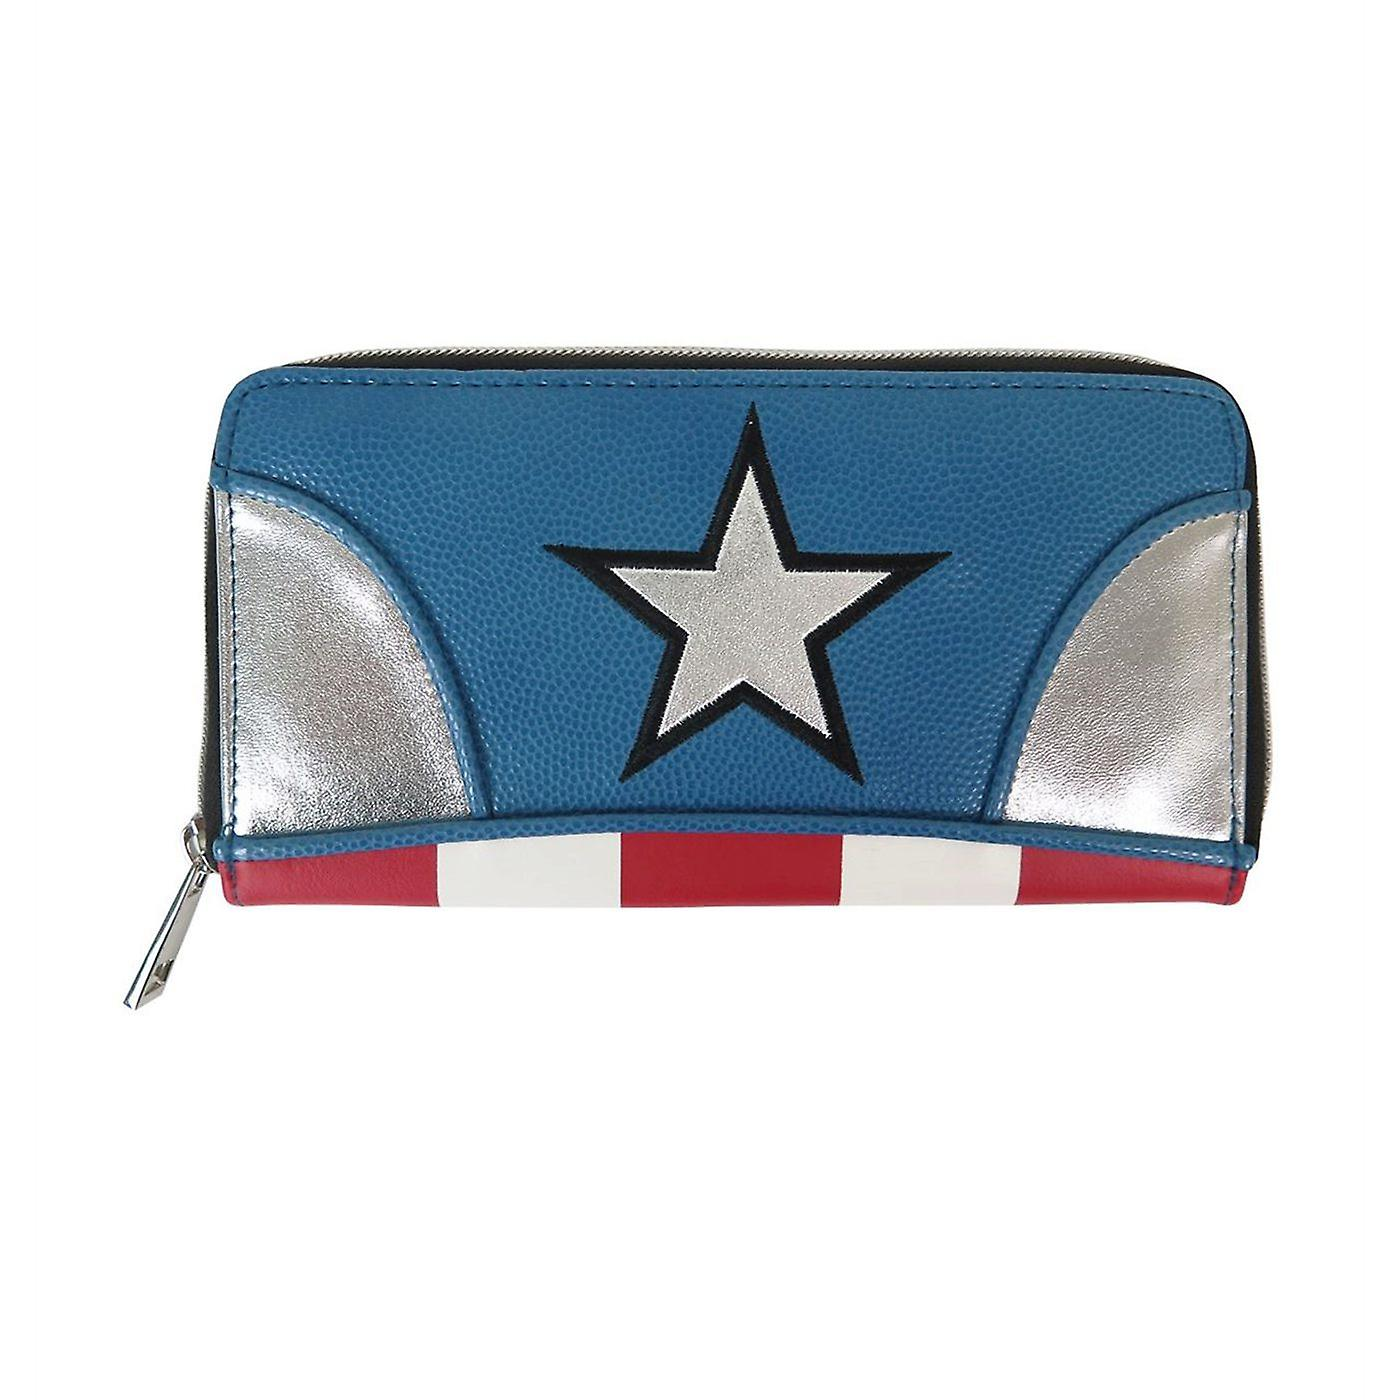 Captain America Suit Up Women's Zipper Wallet